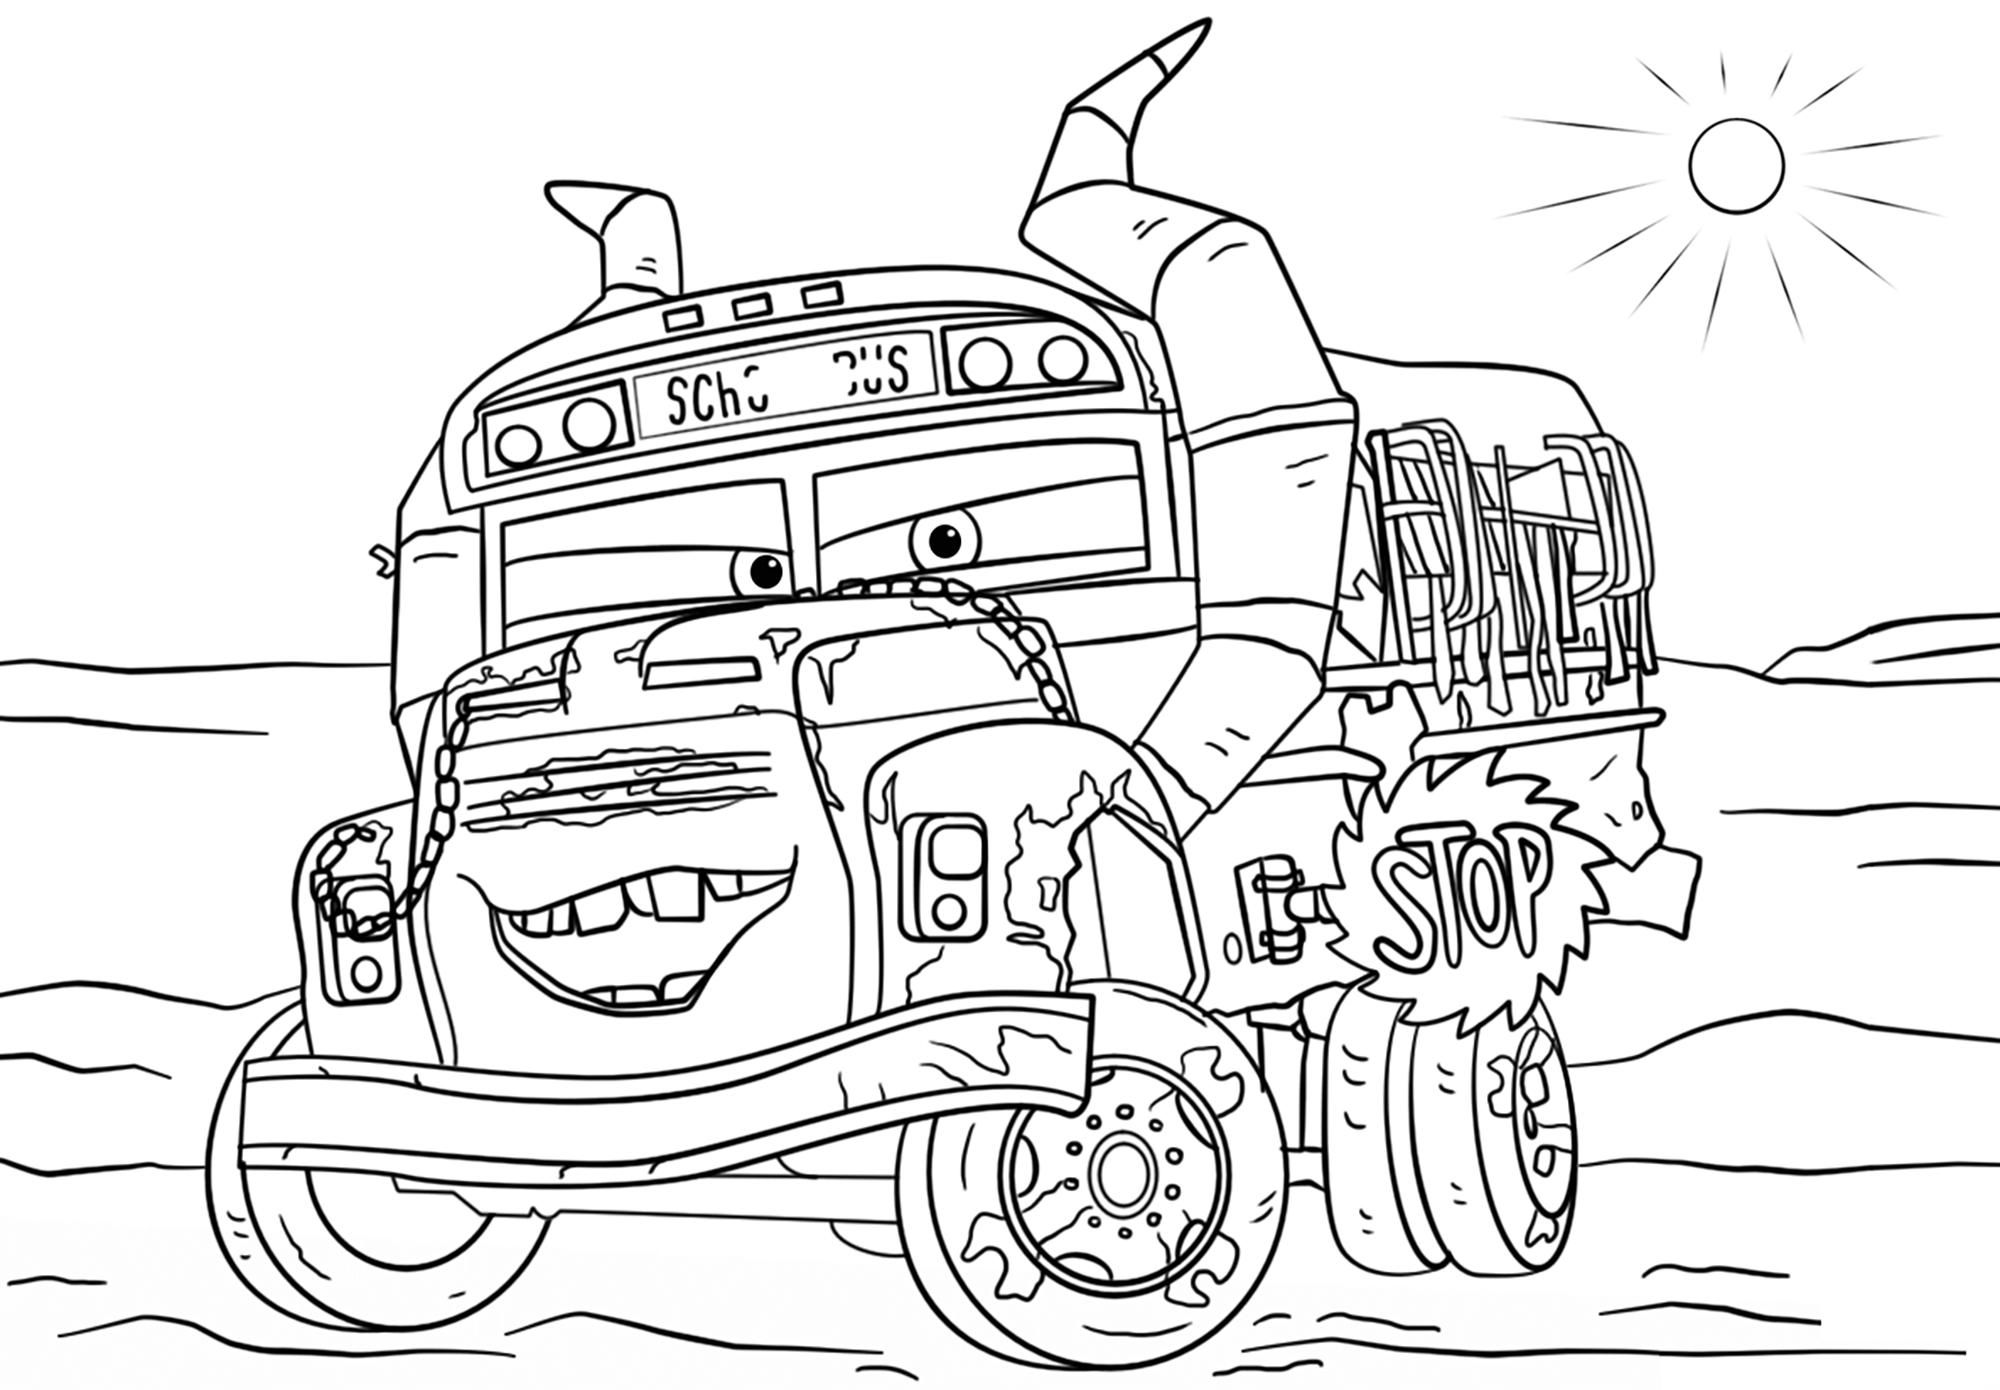 disney pixar cars coloring pages free disney cars coloring pages get coloring pages coloring pixar pages disney cars